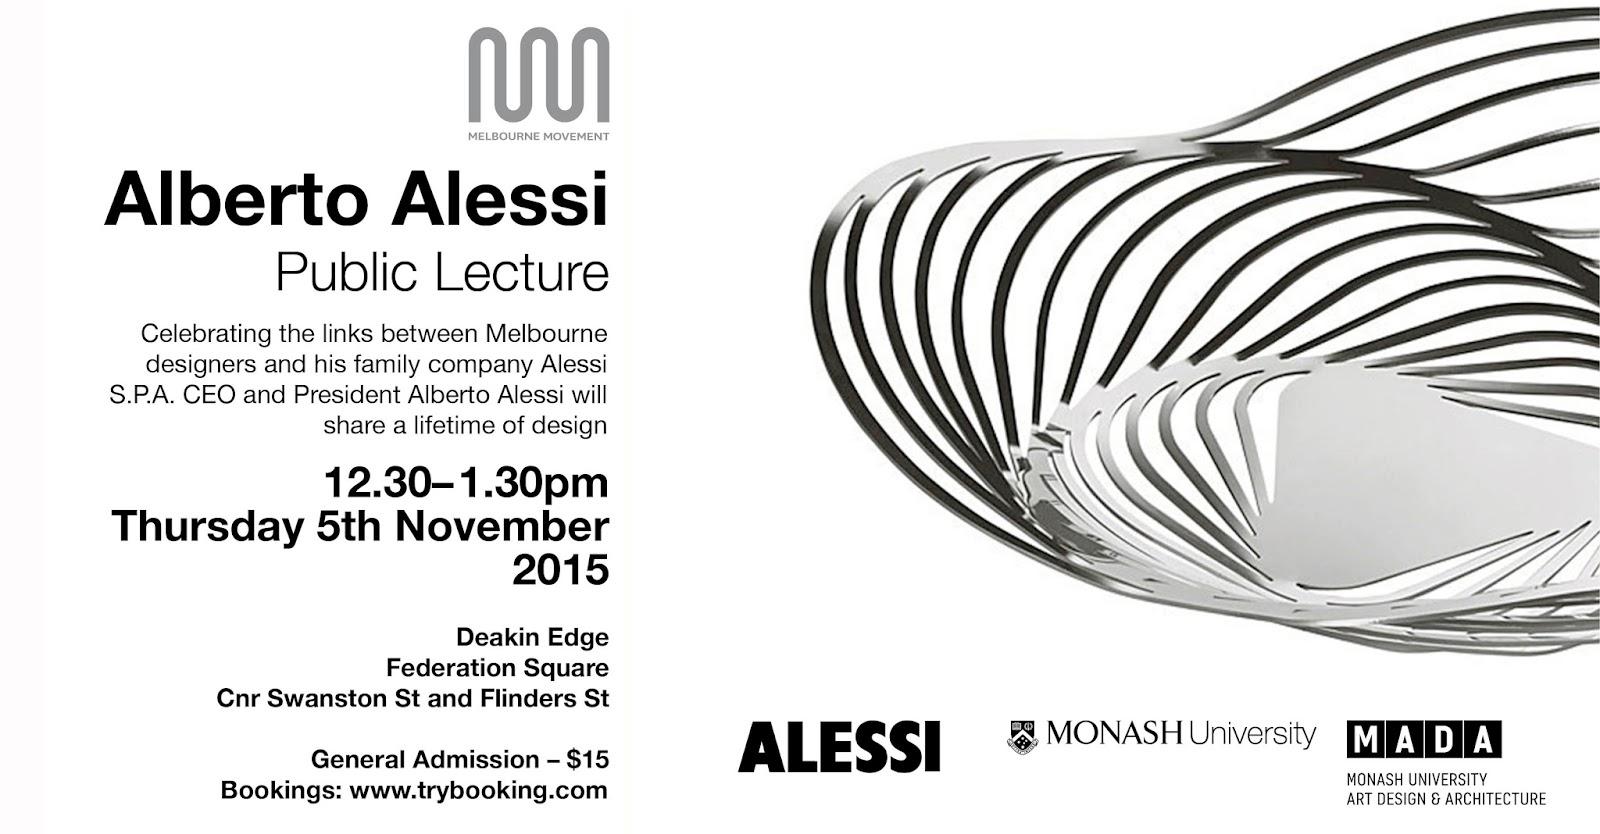 Industrial Design in Victoria Australia: Alberto Alessi